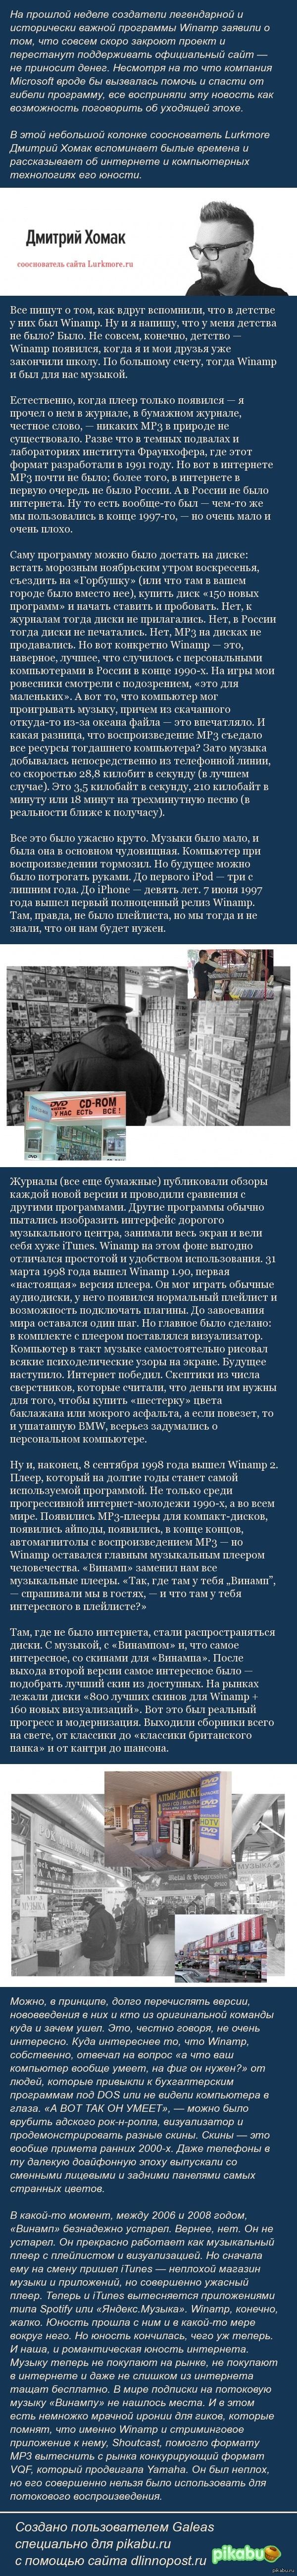 Ностальгия по эпохе Winamp Воспоминания основателя Lurkmore. Источник: http://www.furfur.me/furfur/all/culture/168021-yunost-i-winamp